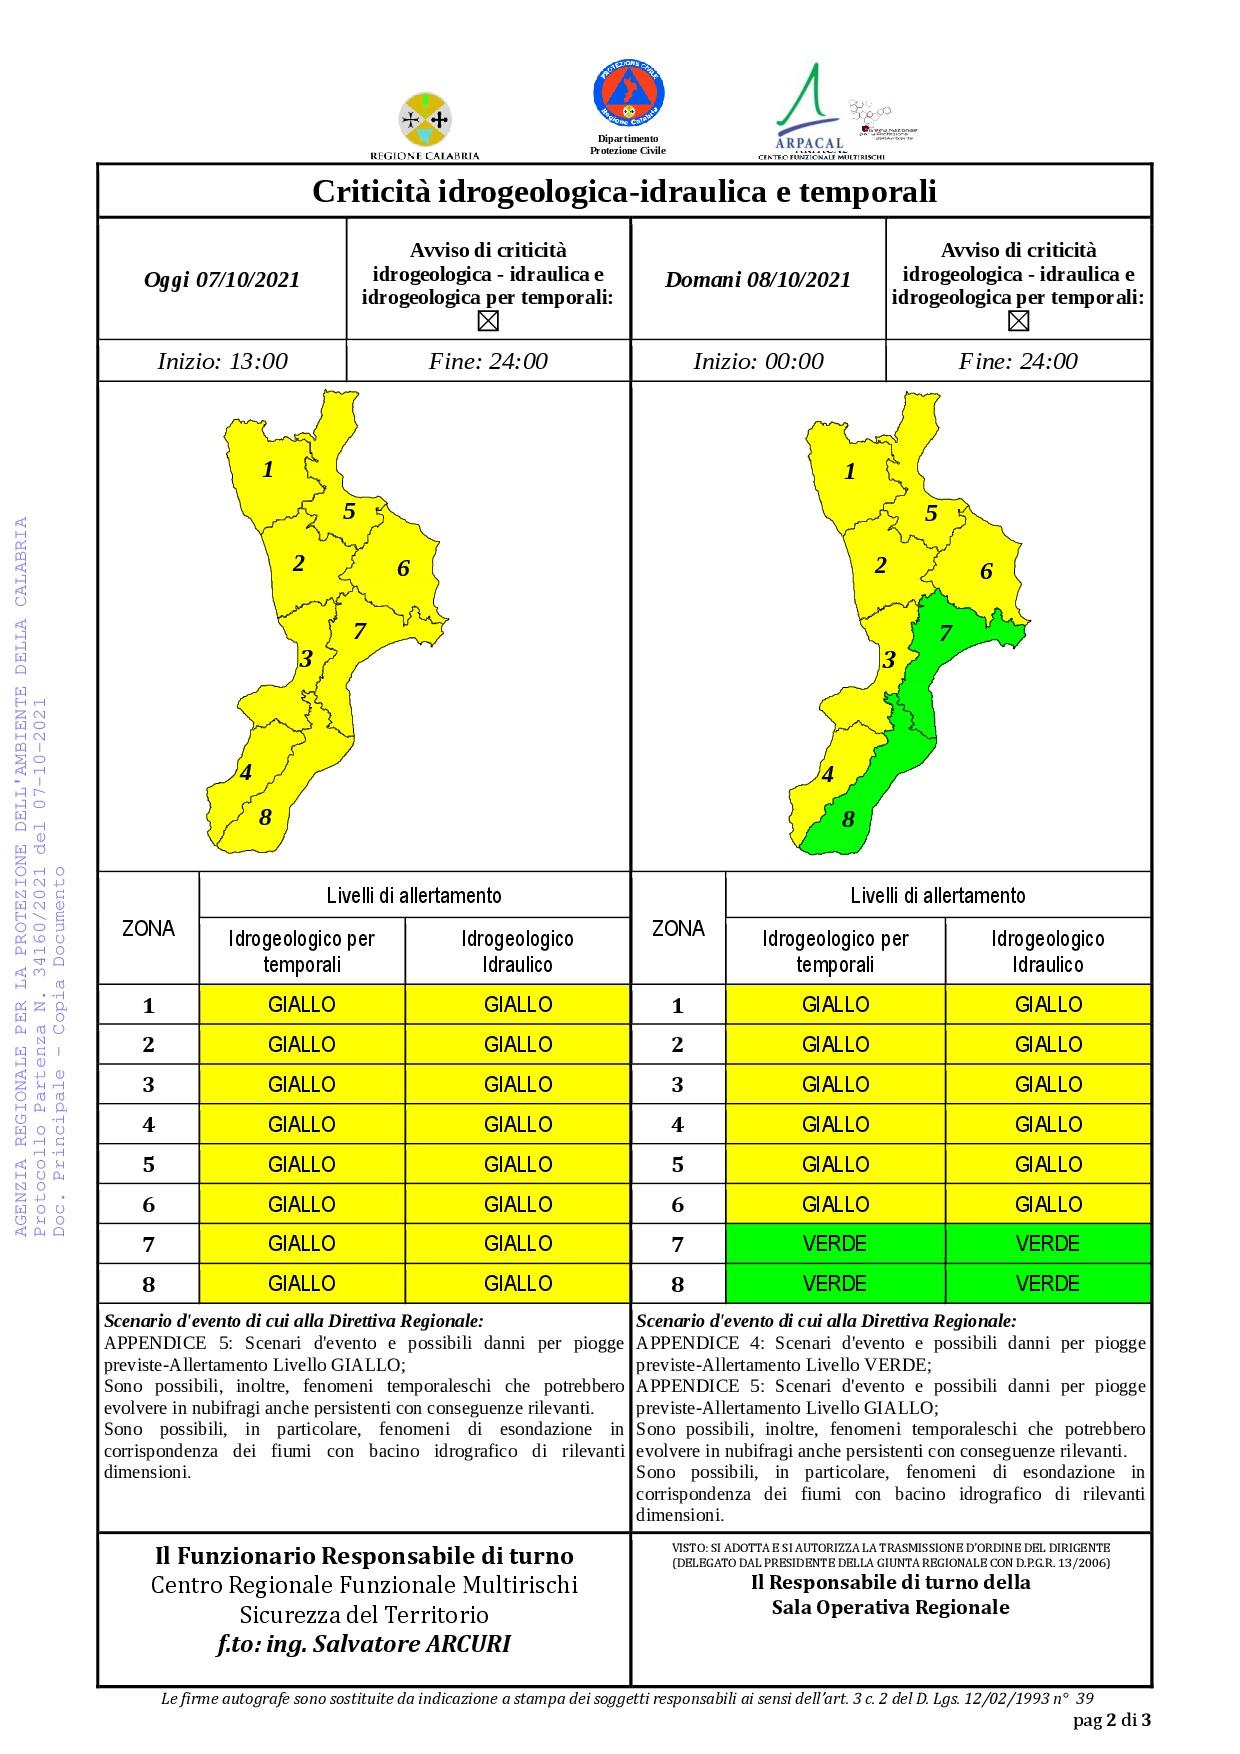 Criticità idrogeologica-idraulica e temporali in Calabria 07-10-2021